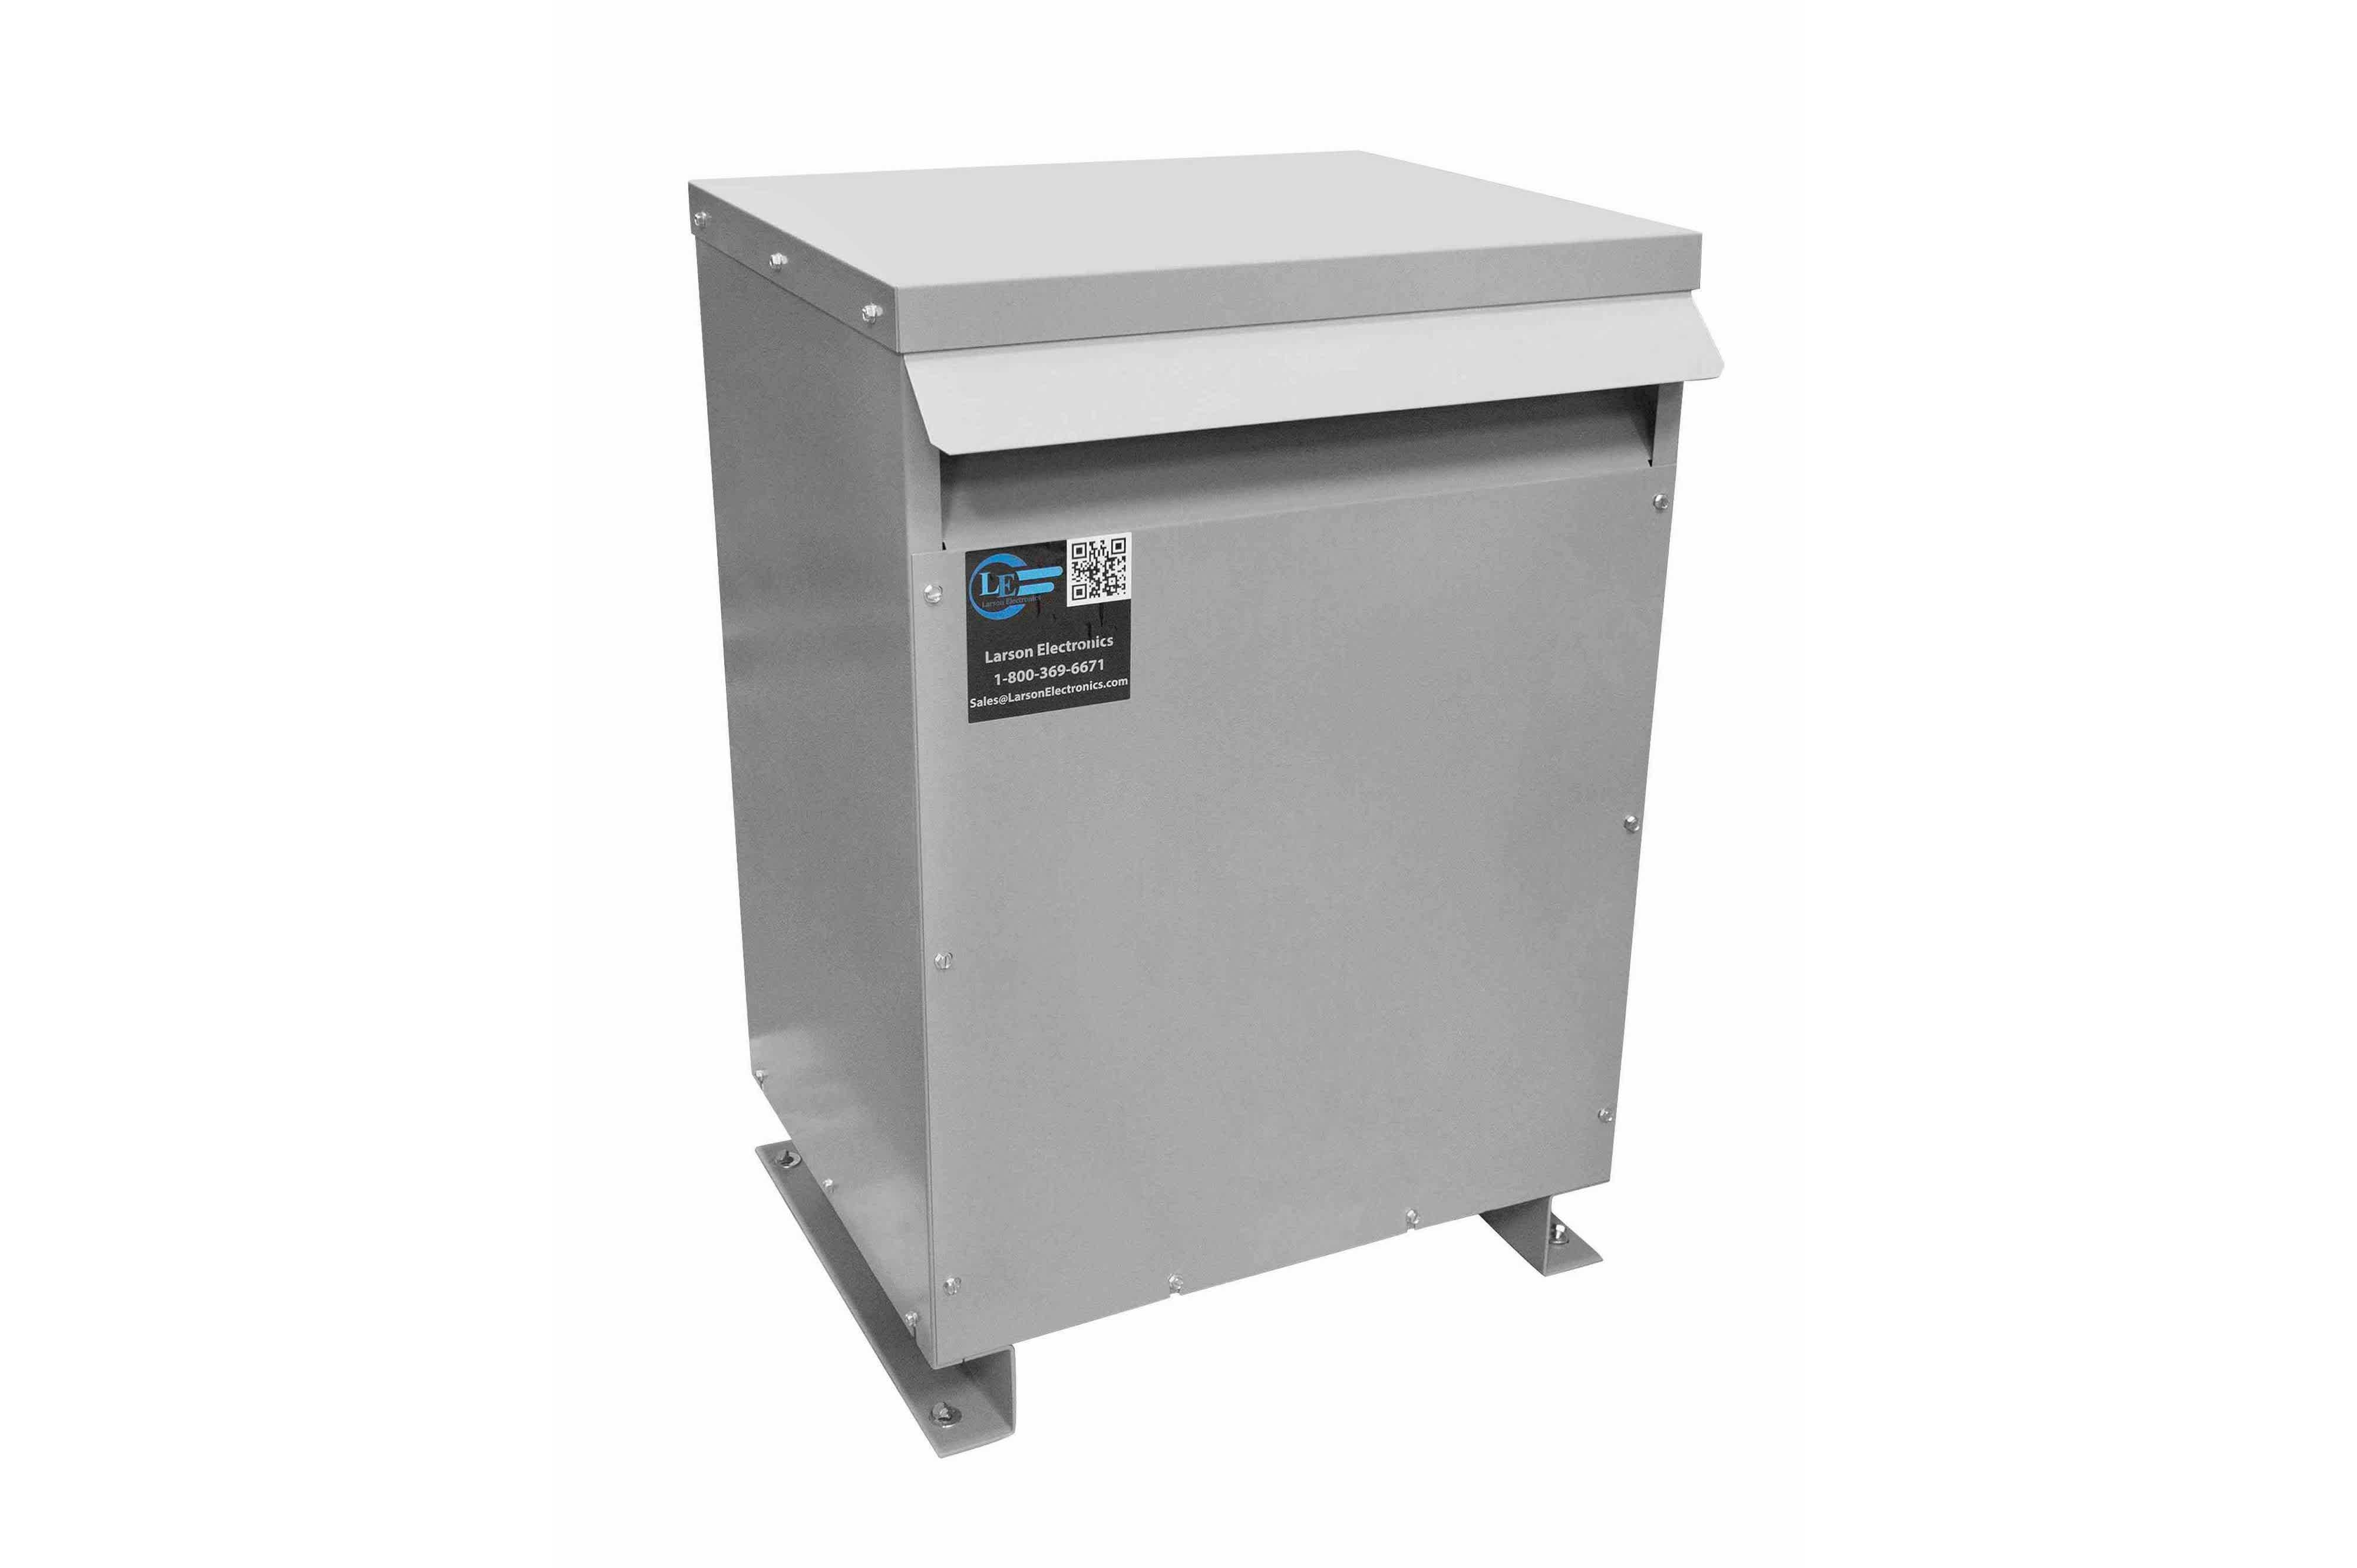 50 kVA 3PH Isolation Transformer, 460V Wye Primary, 380Y/220 Wye-N Secondary, N3R, Ventilated, 60 Hz